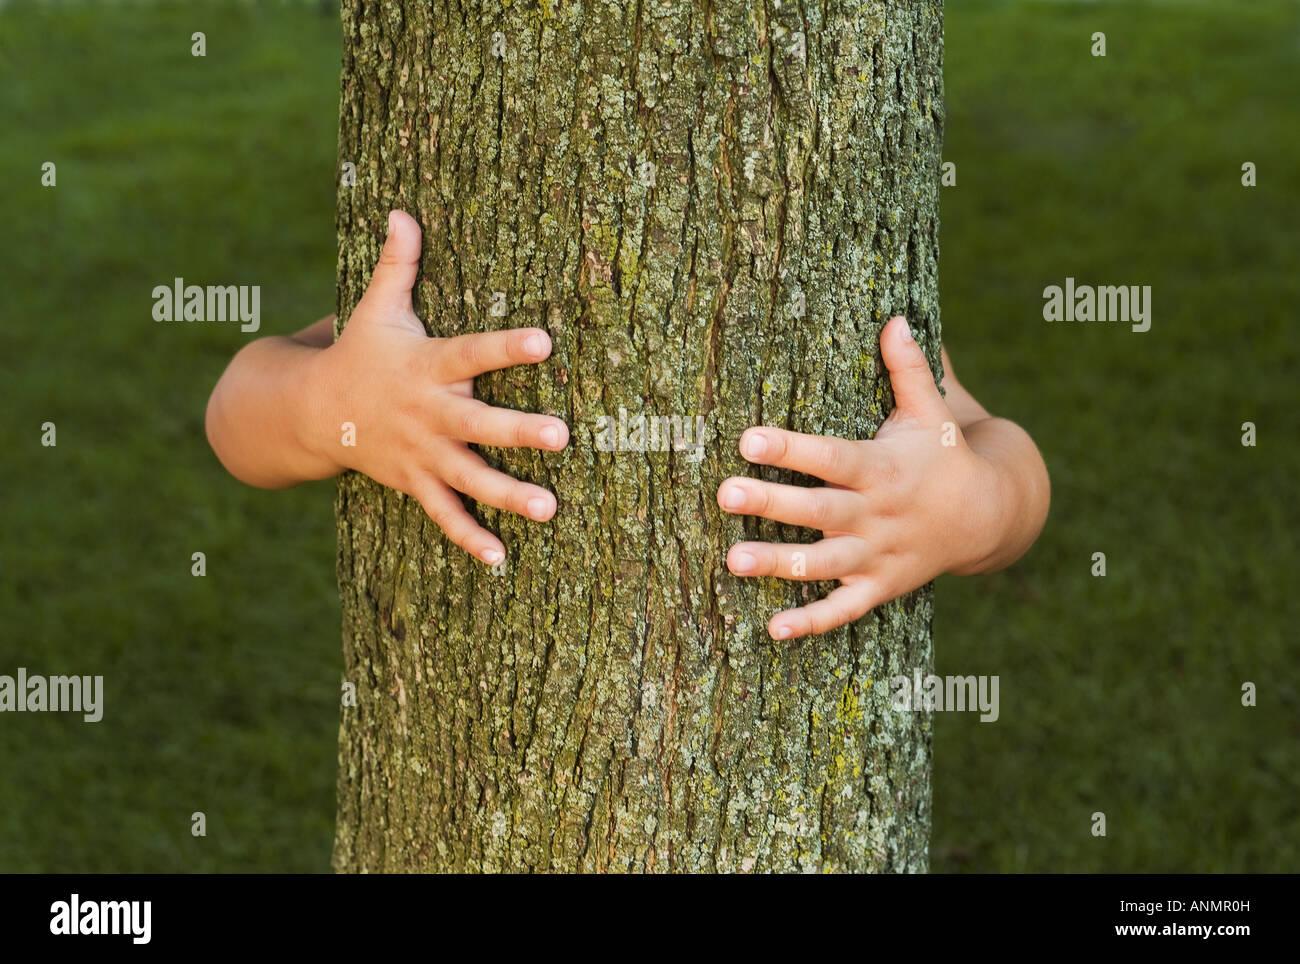 Person hugging tree - Stock Image